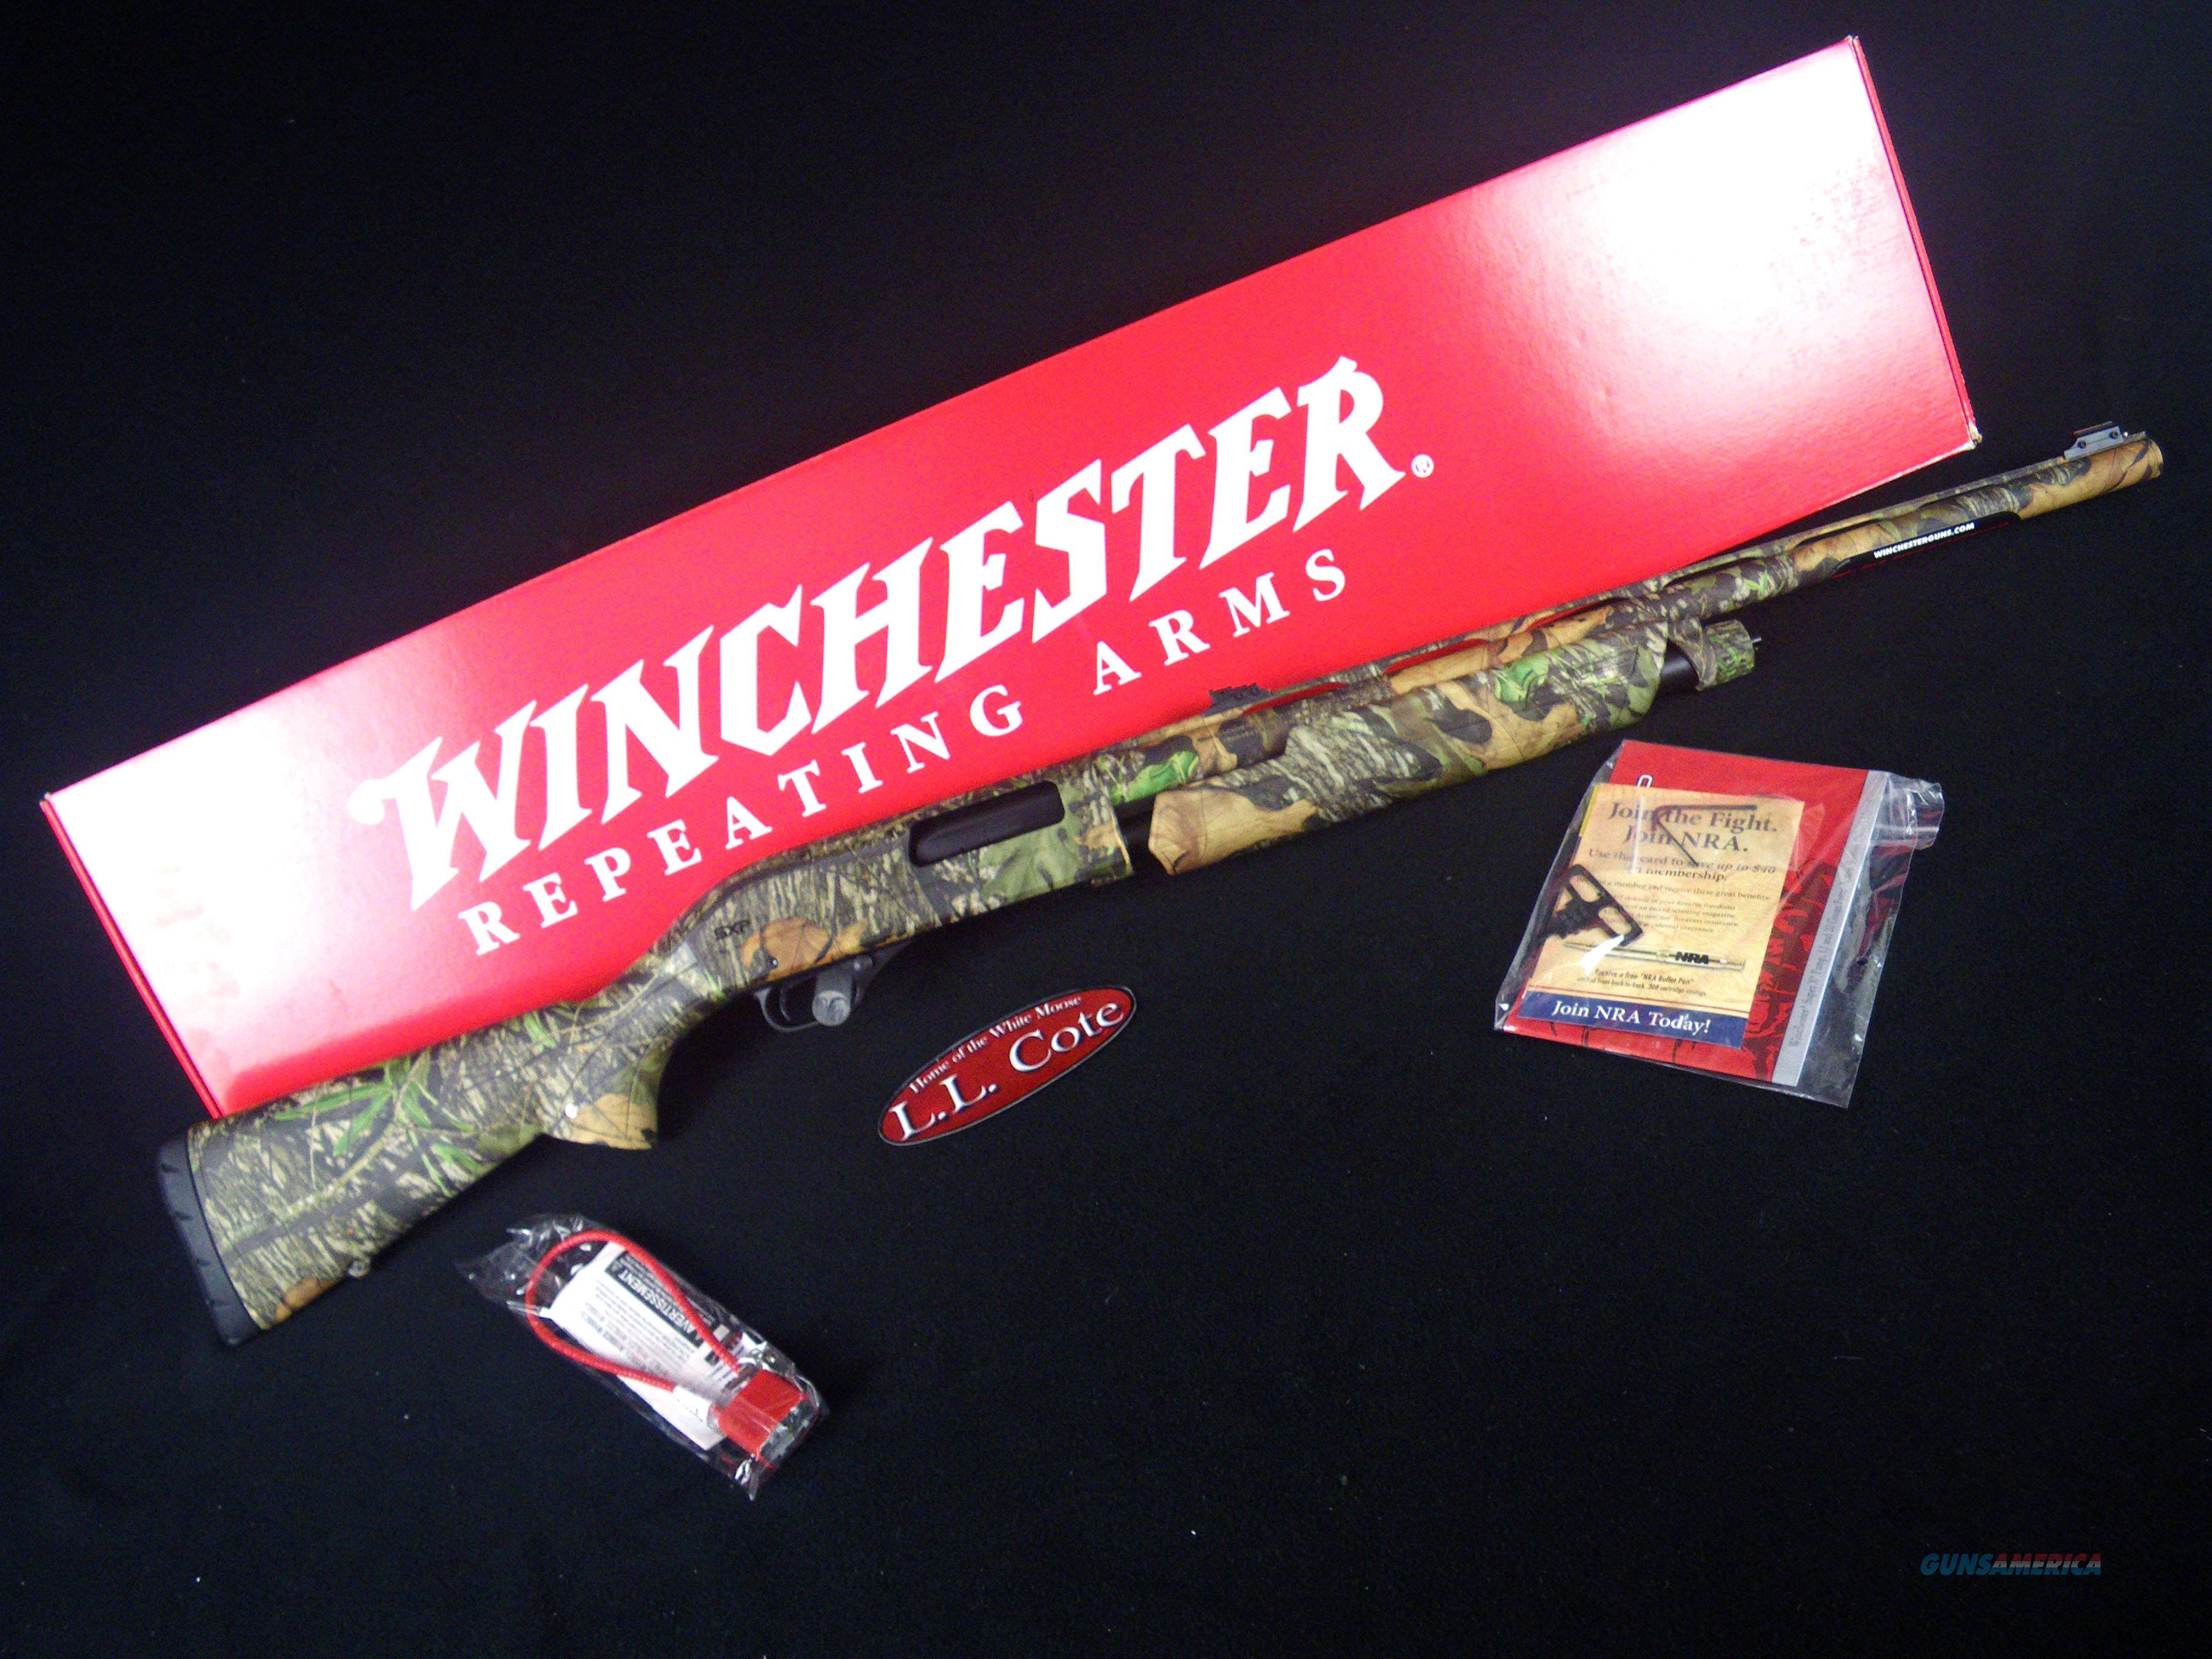 "Winchester SXP NWTF Turkey Hunter 12ga 24"" NEW 3.5"" 512357290  Guns > Shotguns > Winchester Shotguns - Modern > Pump Action > Hunting"